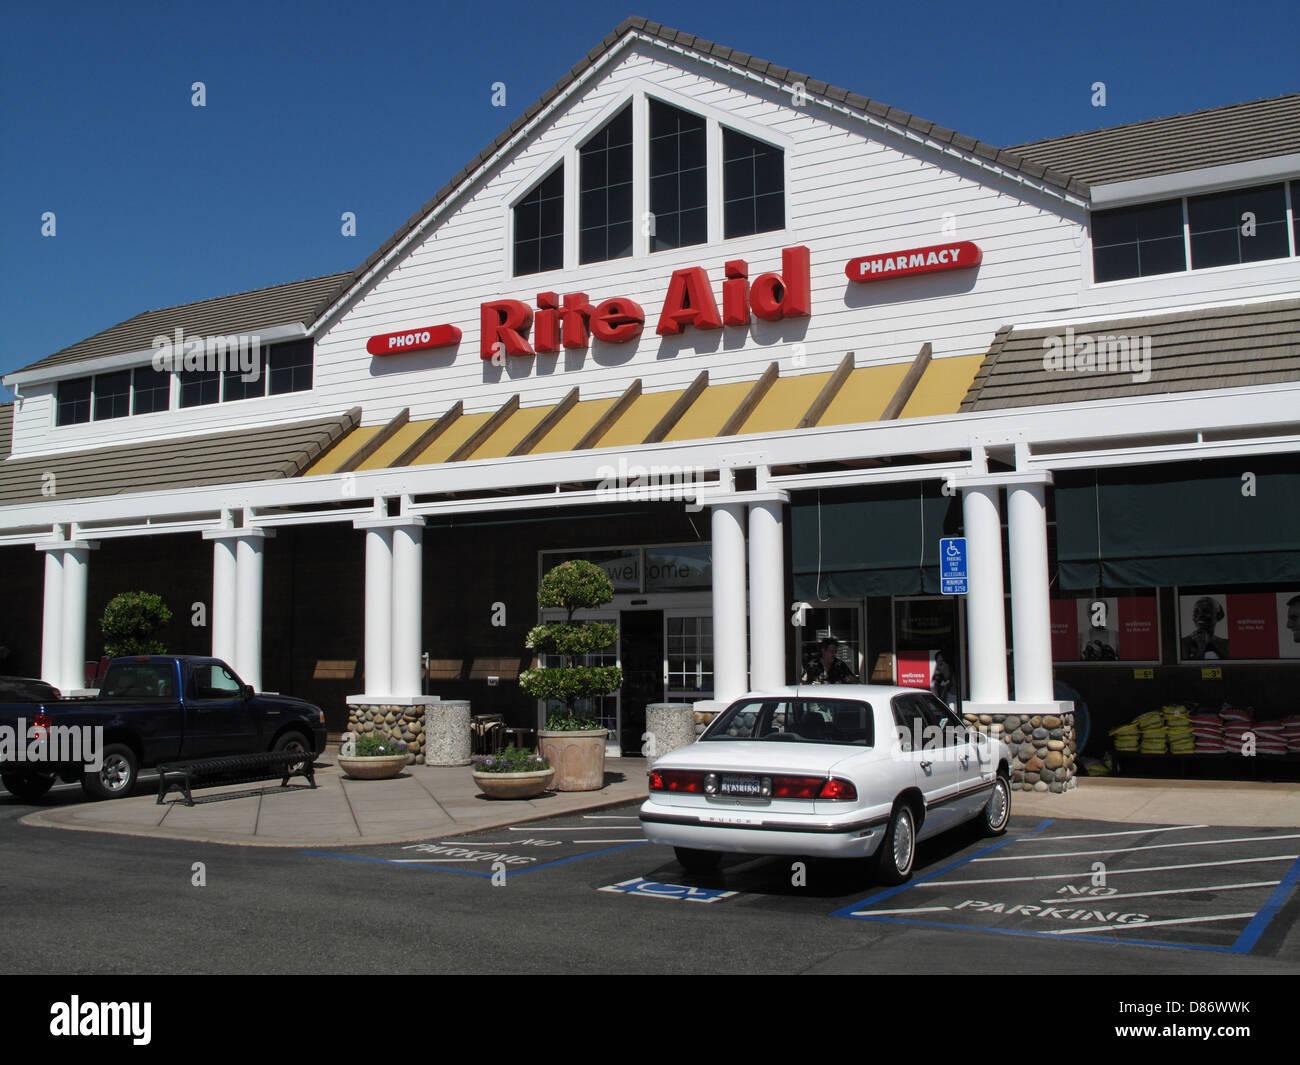 Rite Aid Pharmacy in Los Gatos, California - Stock Image